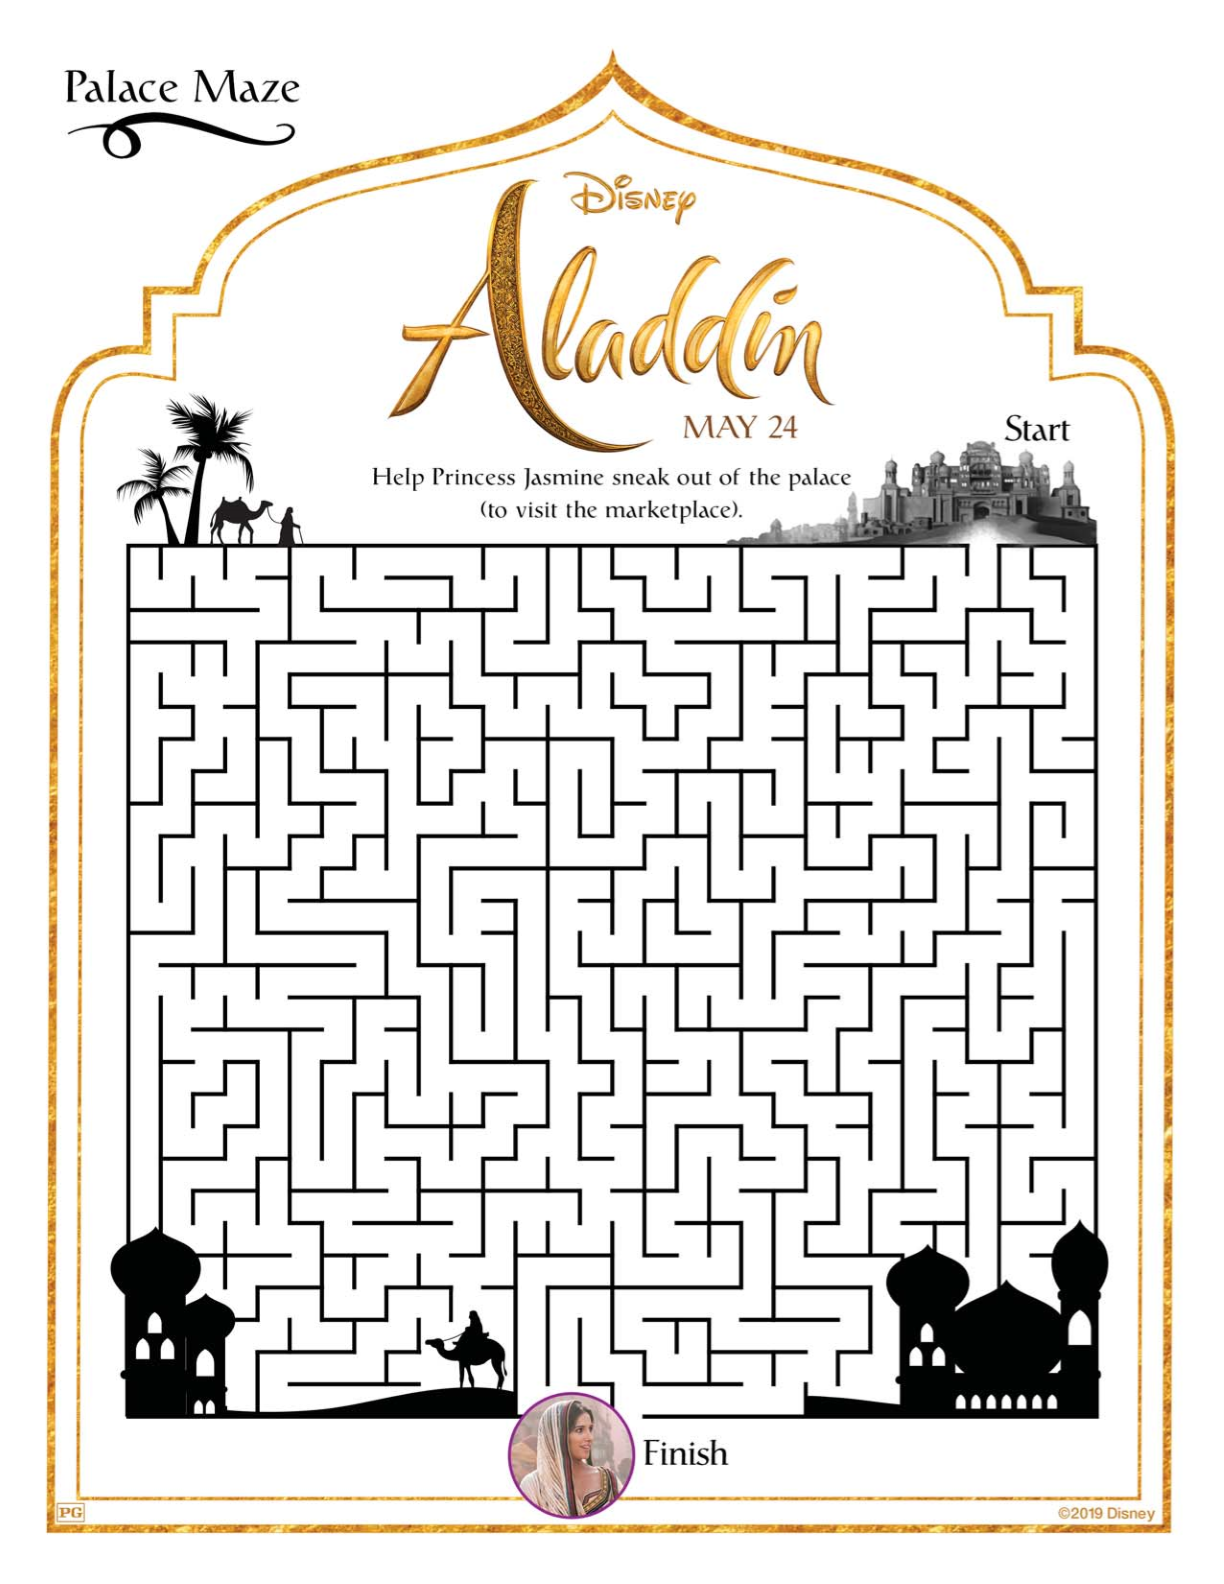 Free Printable Disney Aladdin Palace Maze #disney #aladdin #freeprintable #printable #maze #printablemaze